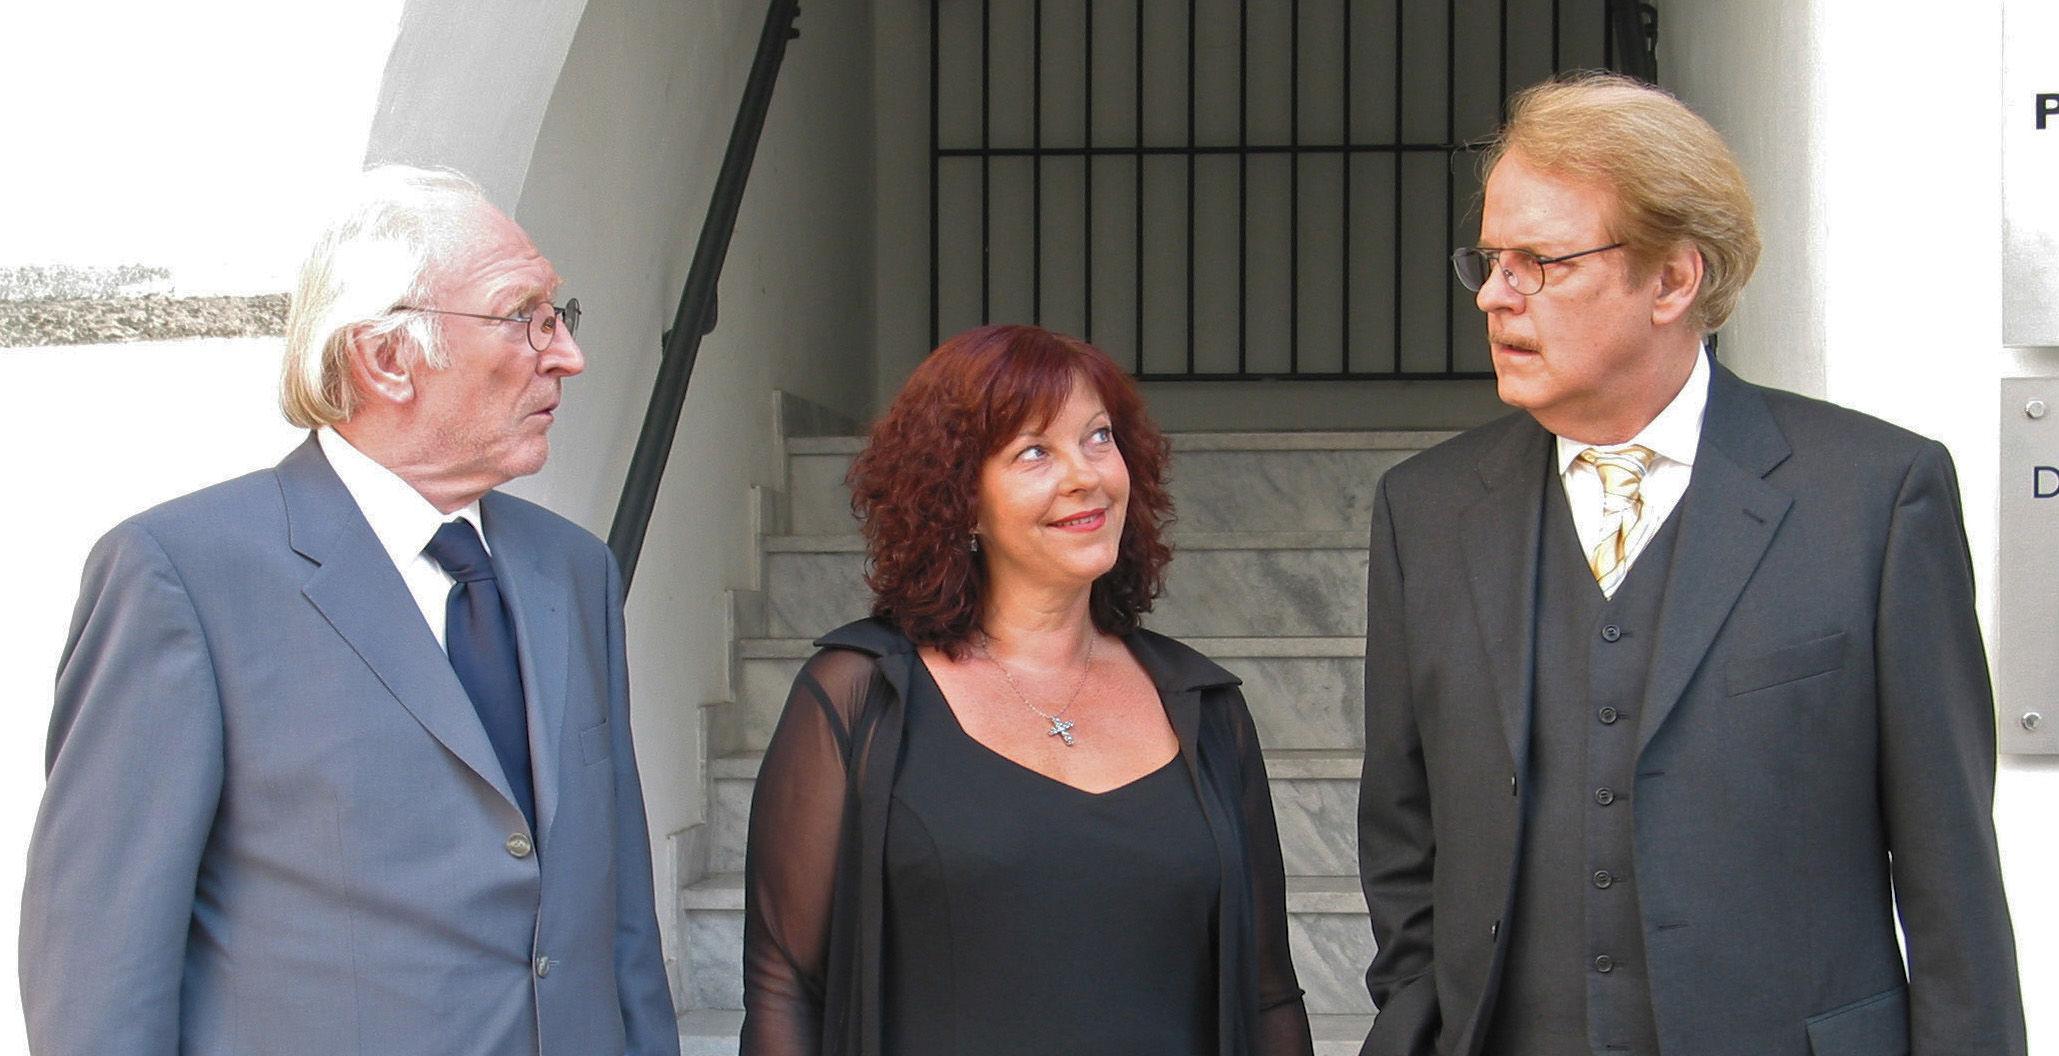 Paul (Karl Merkatz), Conny (Elfi Eschke), Albert (Peter Fricke)